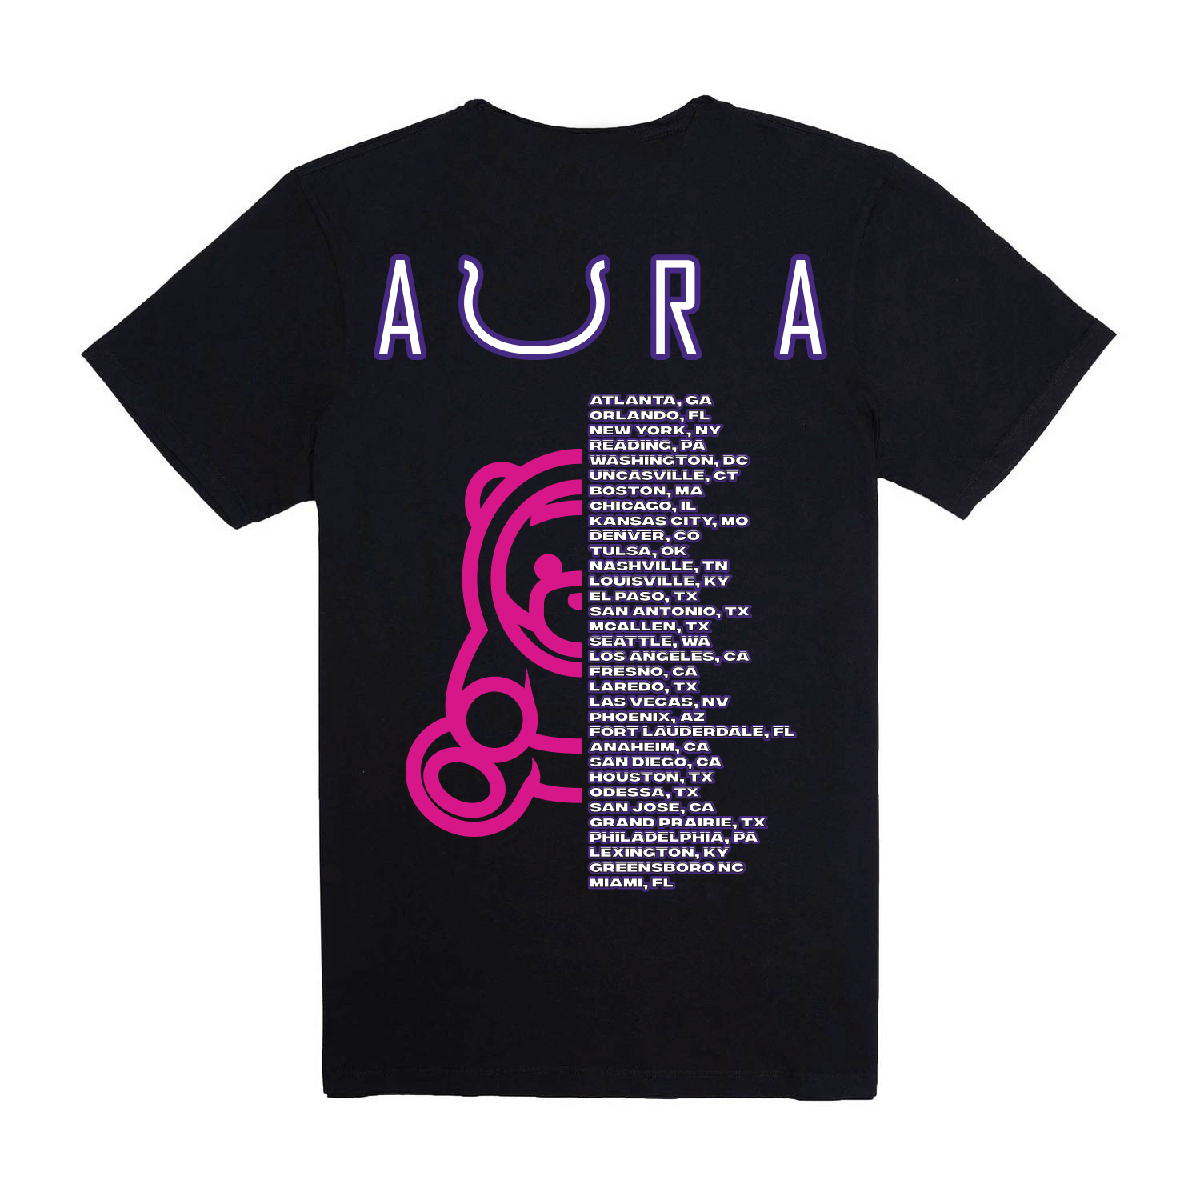 Ozuna Aura Tour T-shirt